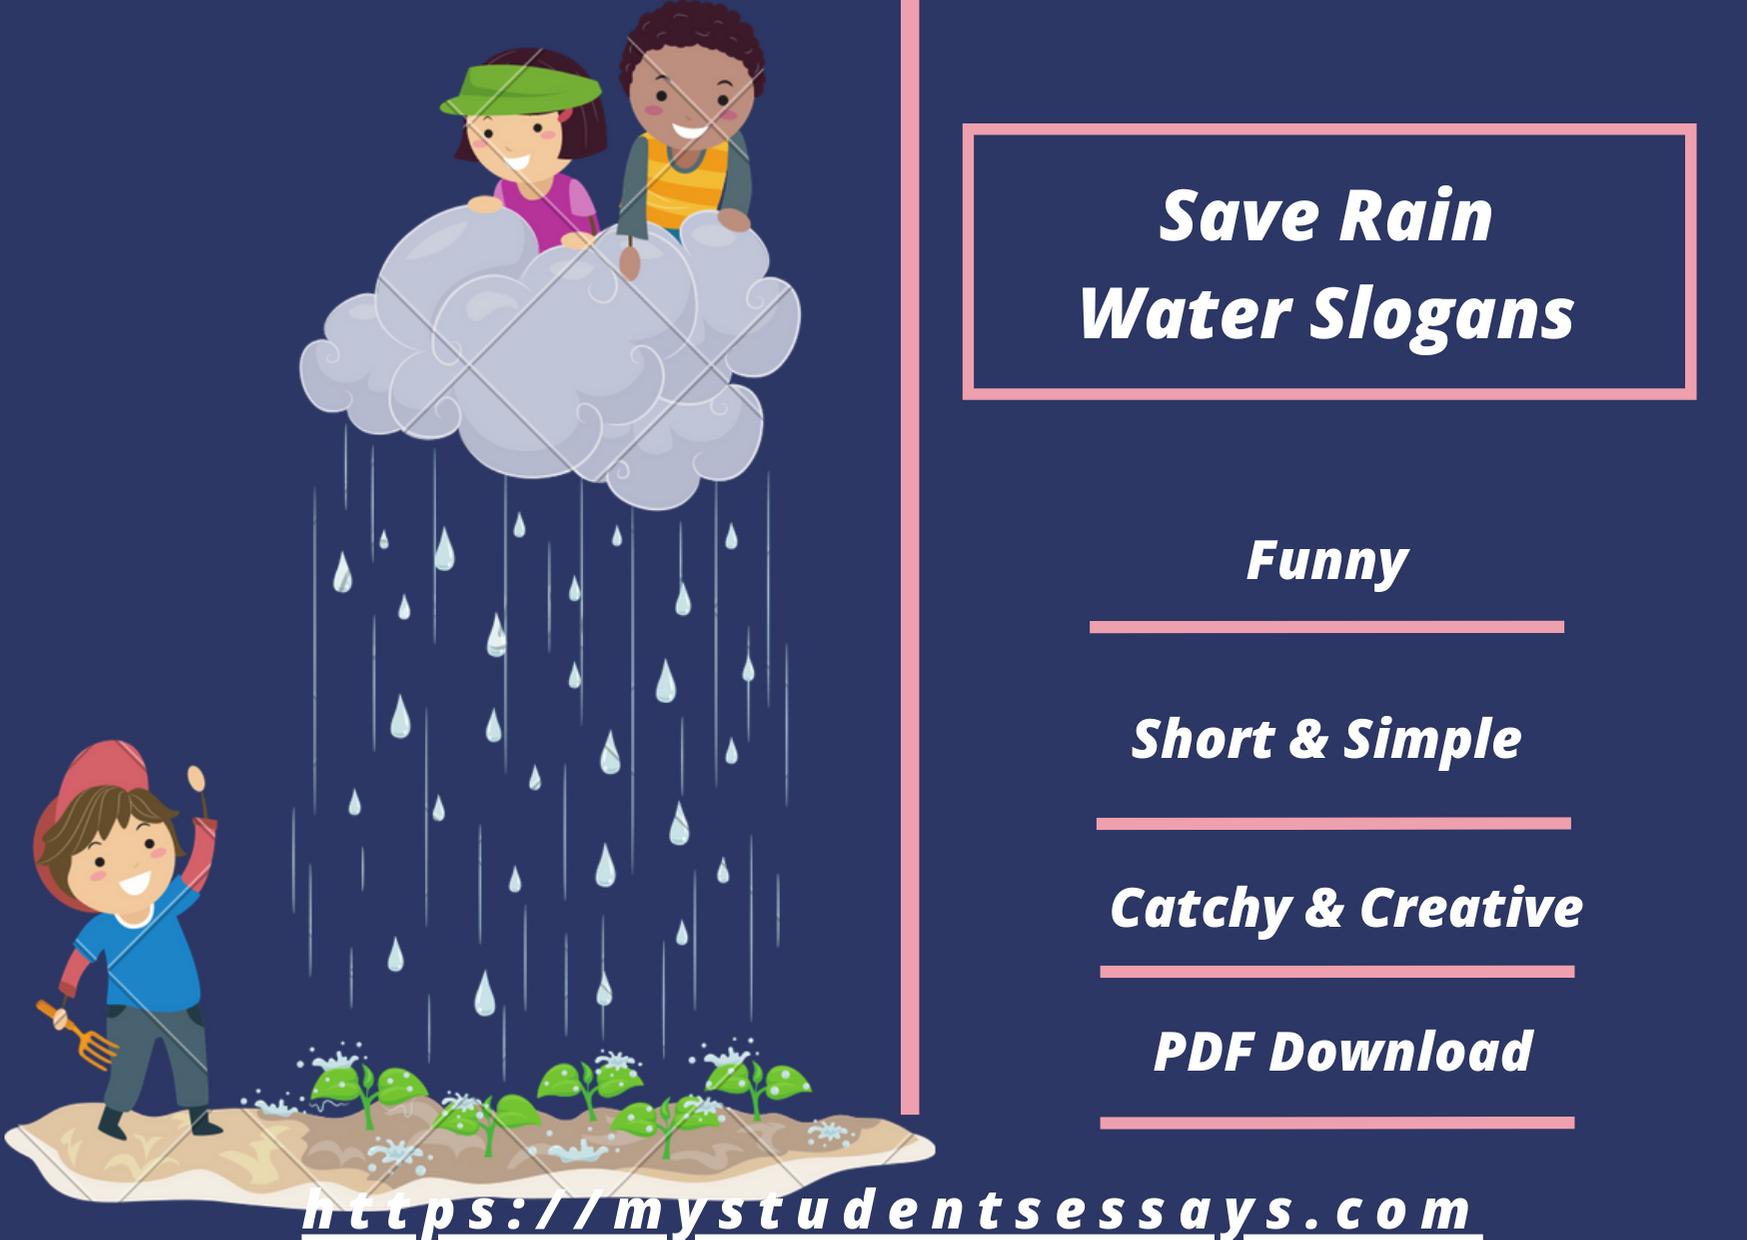 Save rain water slogans